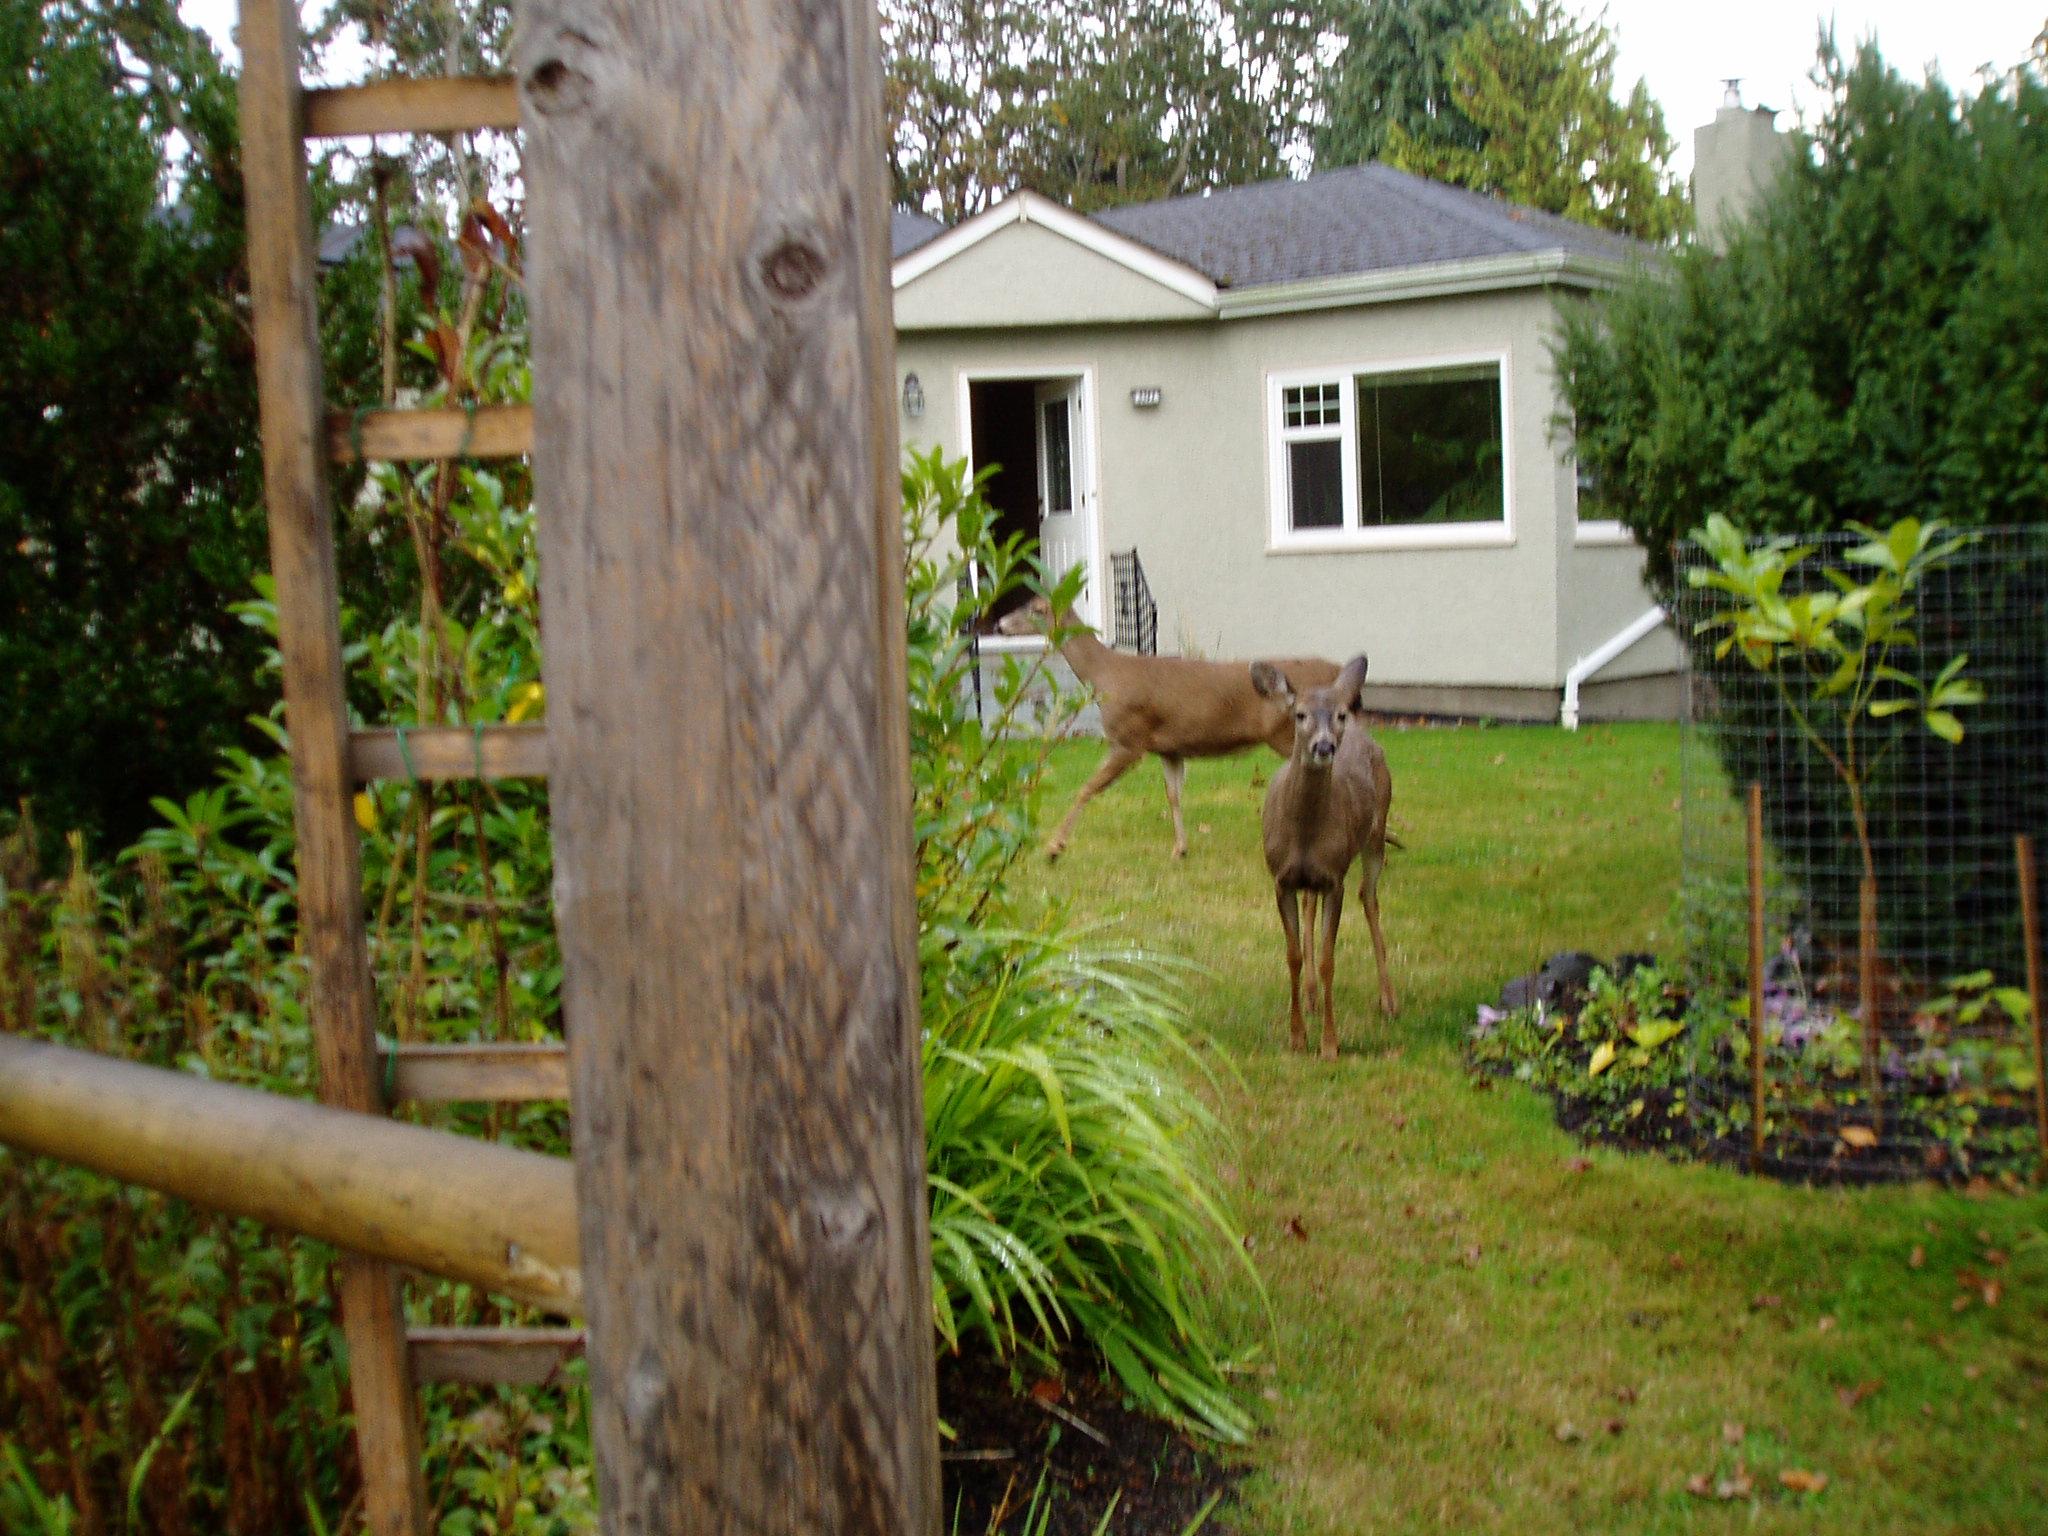 deer repellent for gardens. Deer Family In Our Yard 10/11 Repellent For Gardens